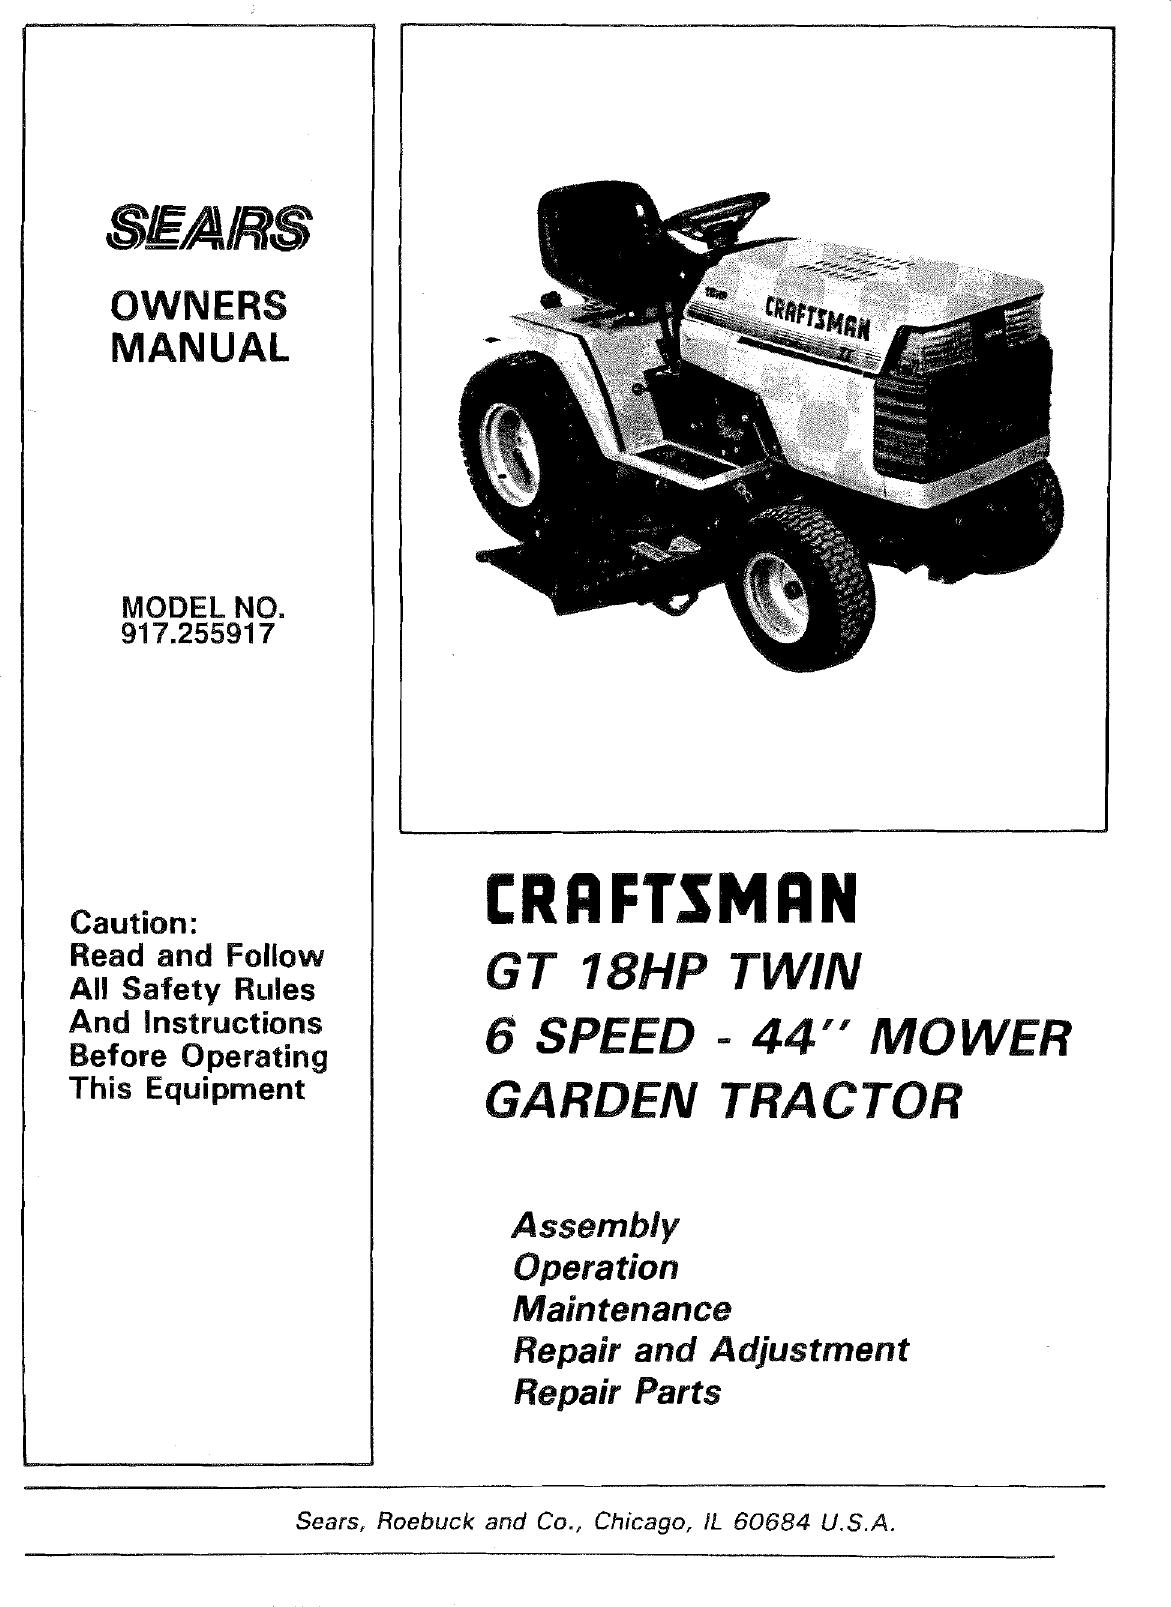 Craftsman 917255917 User Manual GT 18 TWIN GARDEN TRACTOR